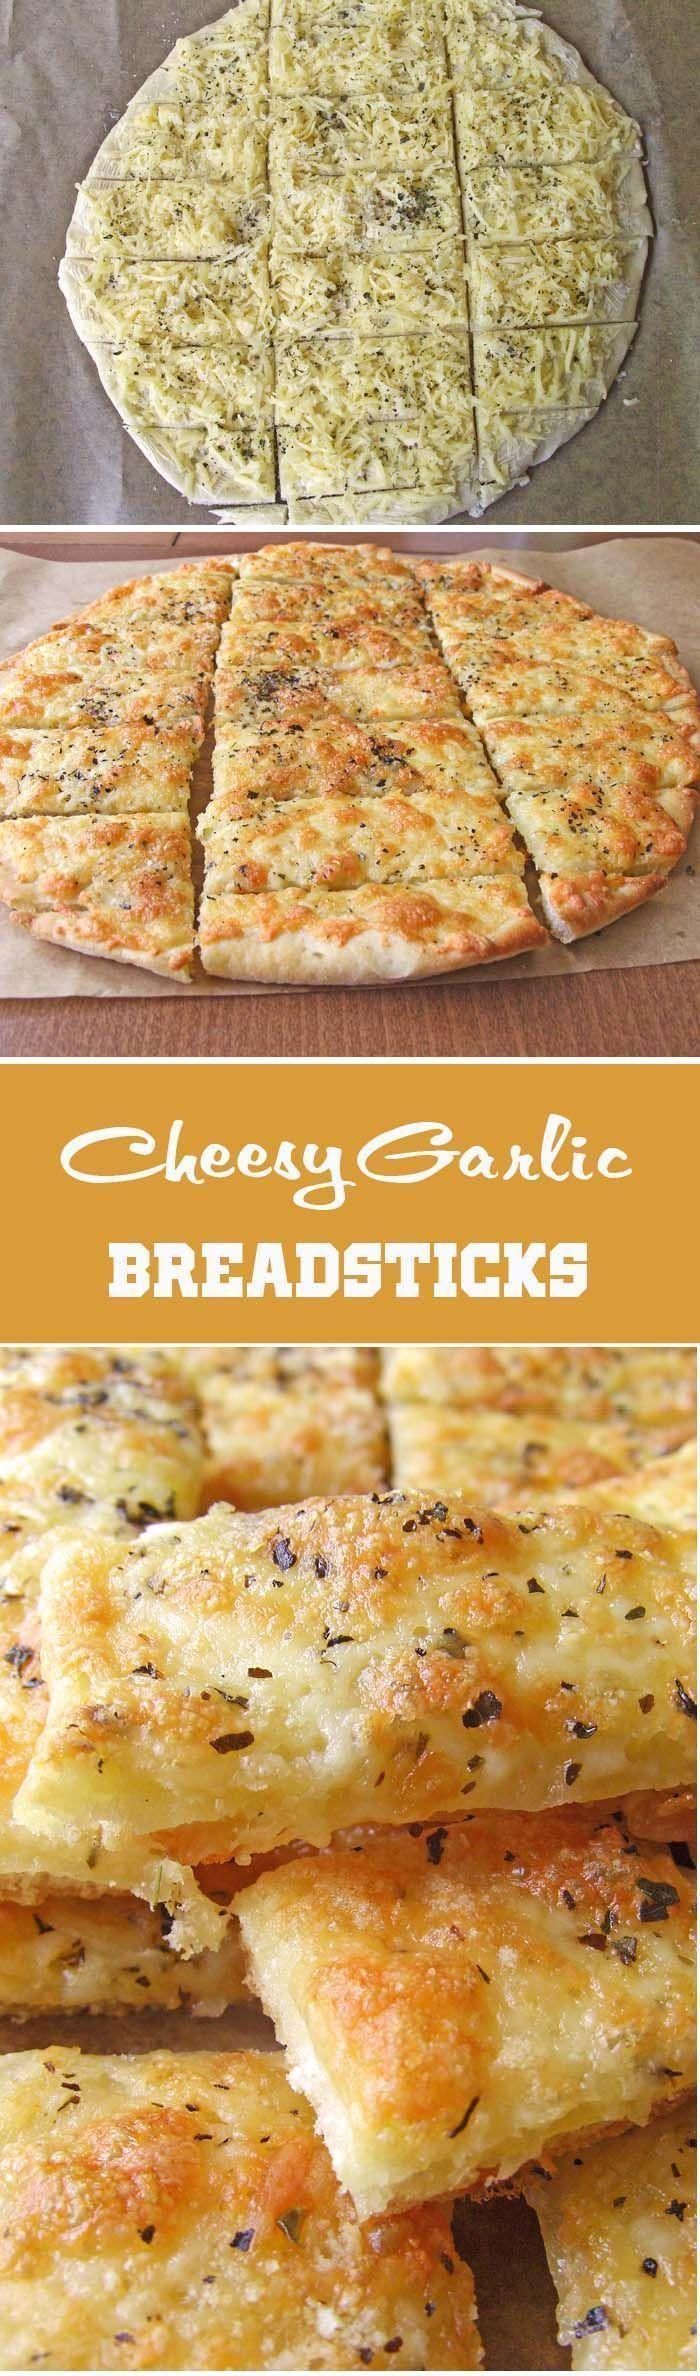 Easy Cheesy Garlic Breadsticks | http://www.sugarapron.com | #recipes #garlic #breadsticks